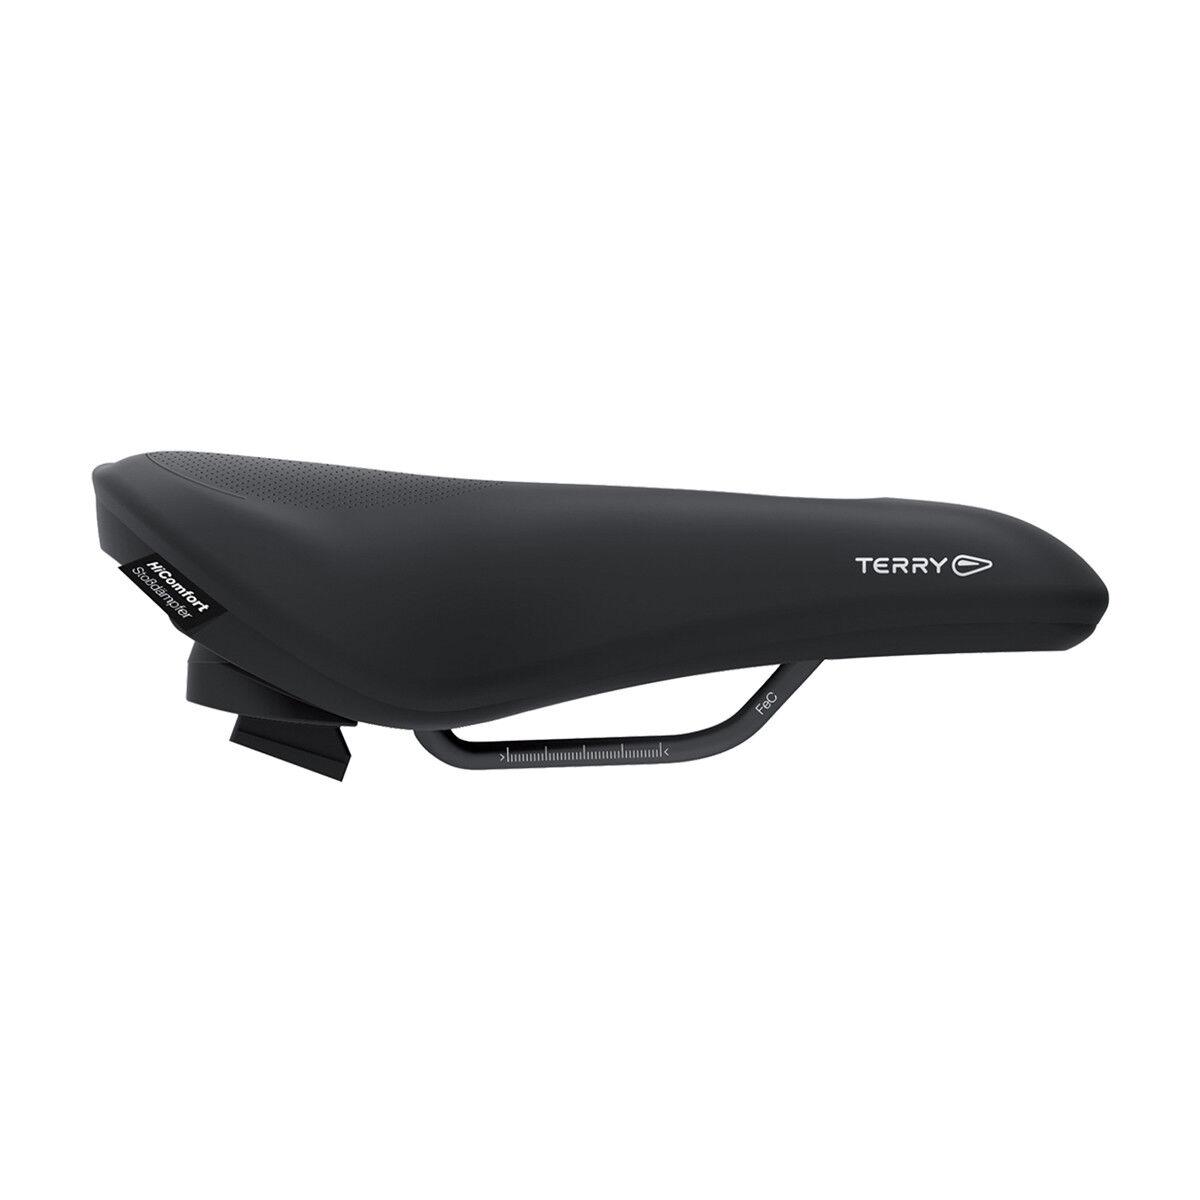 Terry Fisio Flex Gel Max damen Comfort Damen Trekking Fahrrad Sattel schwarz